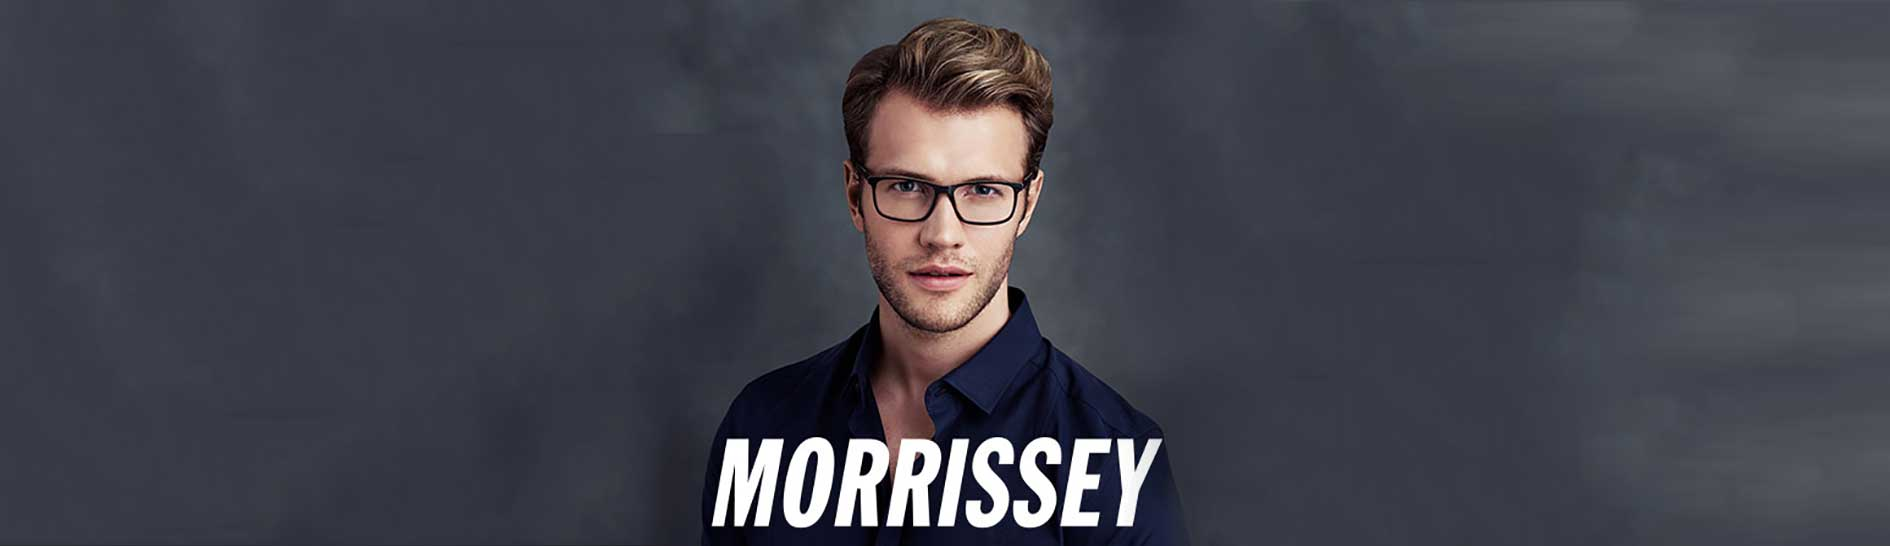 Morrissey Eyewear